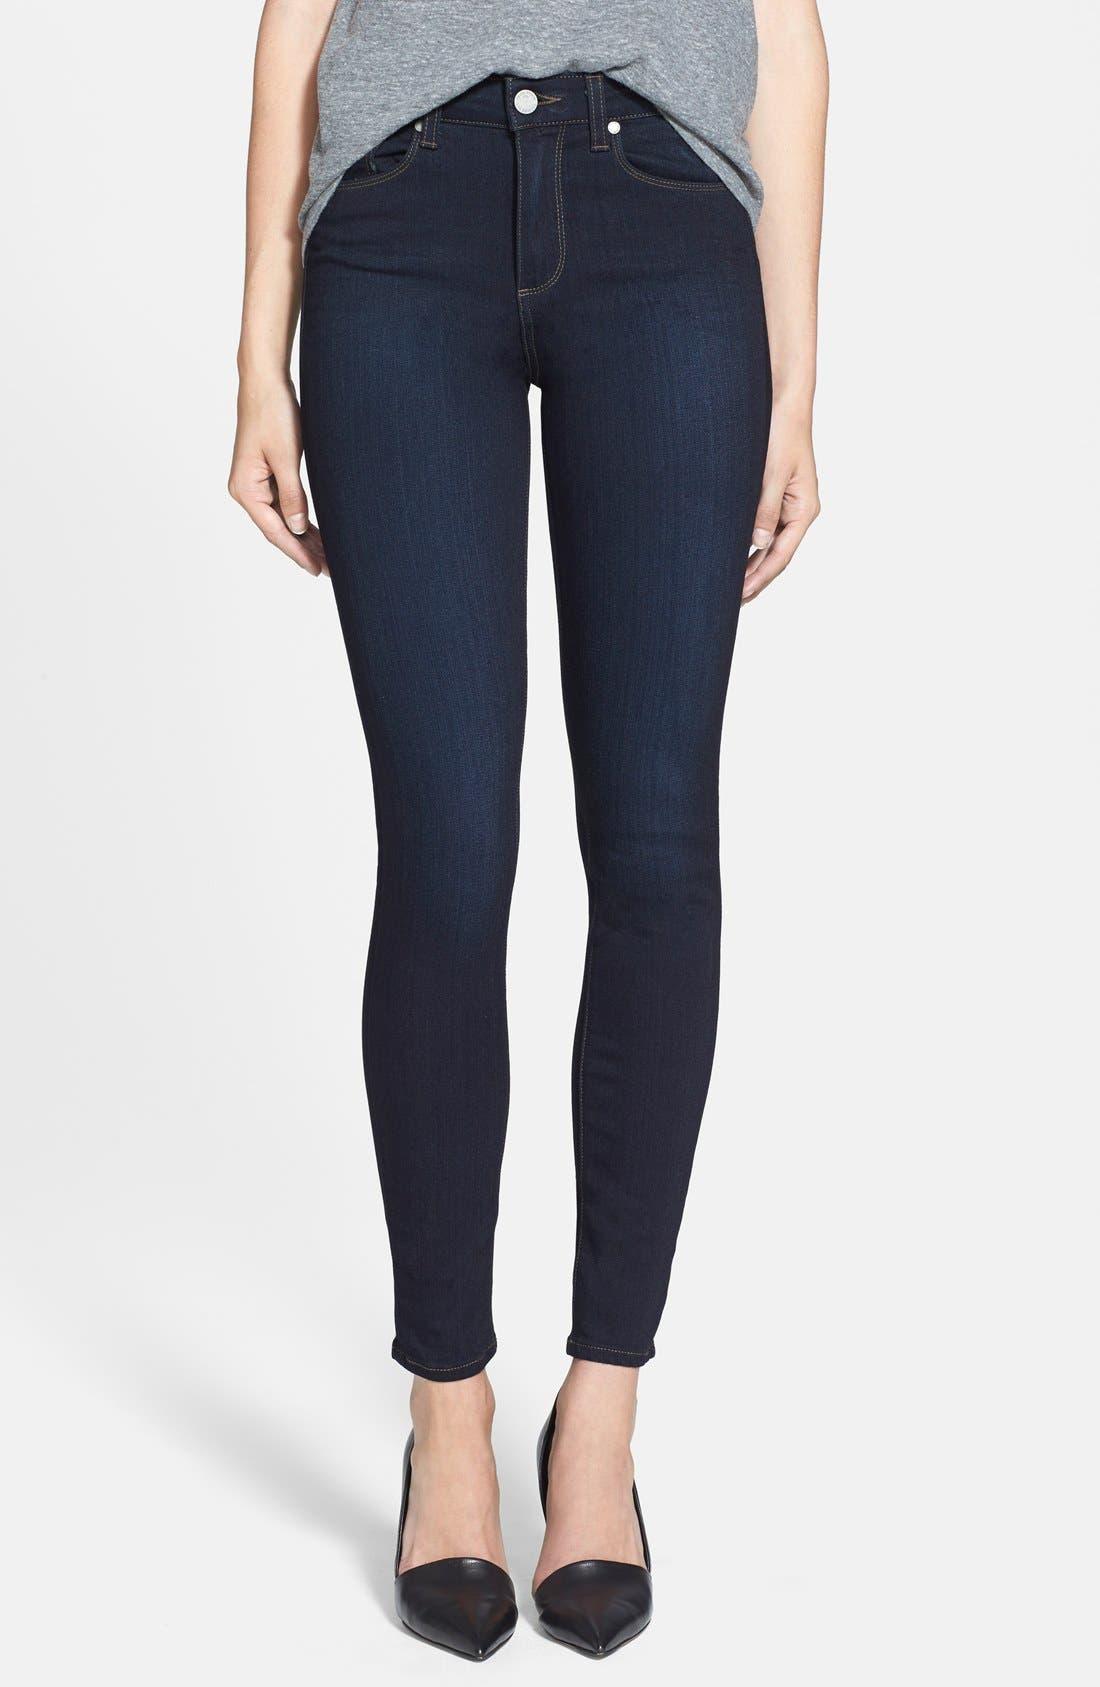 Transcend - Hoxton High Waist Ultra Skinny Jeans,                         Main,                         color, MONA